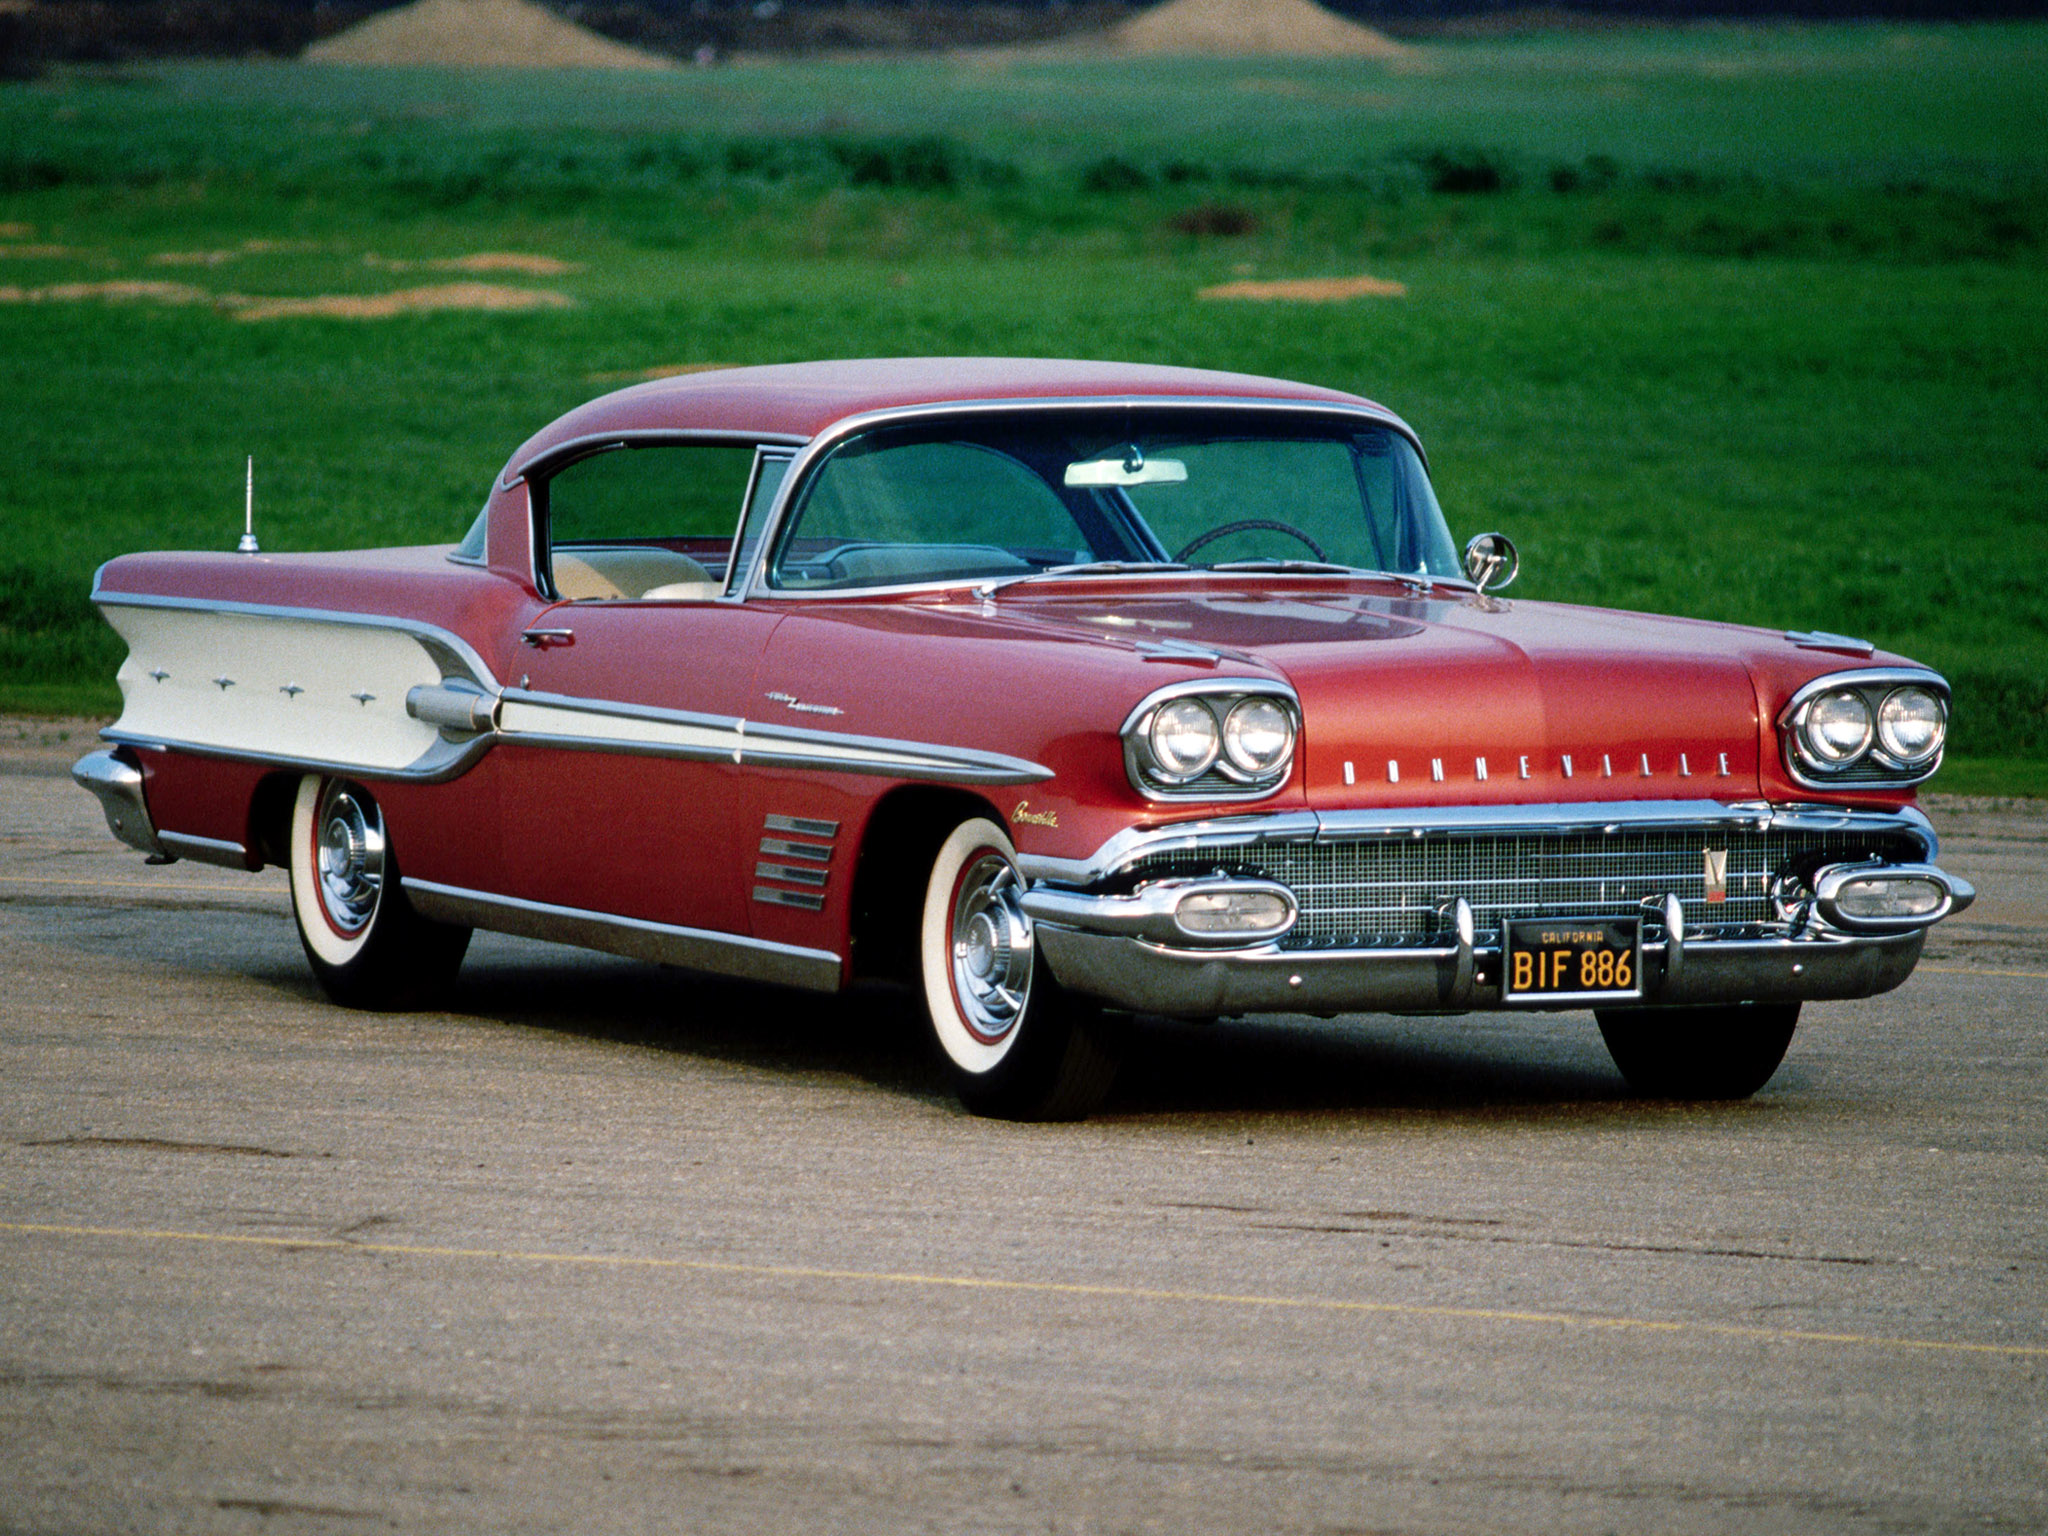 1959 Pontiac Catalina For Salepontiac Bonneville Convertible 1960 Station Wagon 1958 Custom Sport Coupe Retro Wallpaper